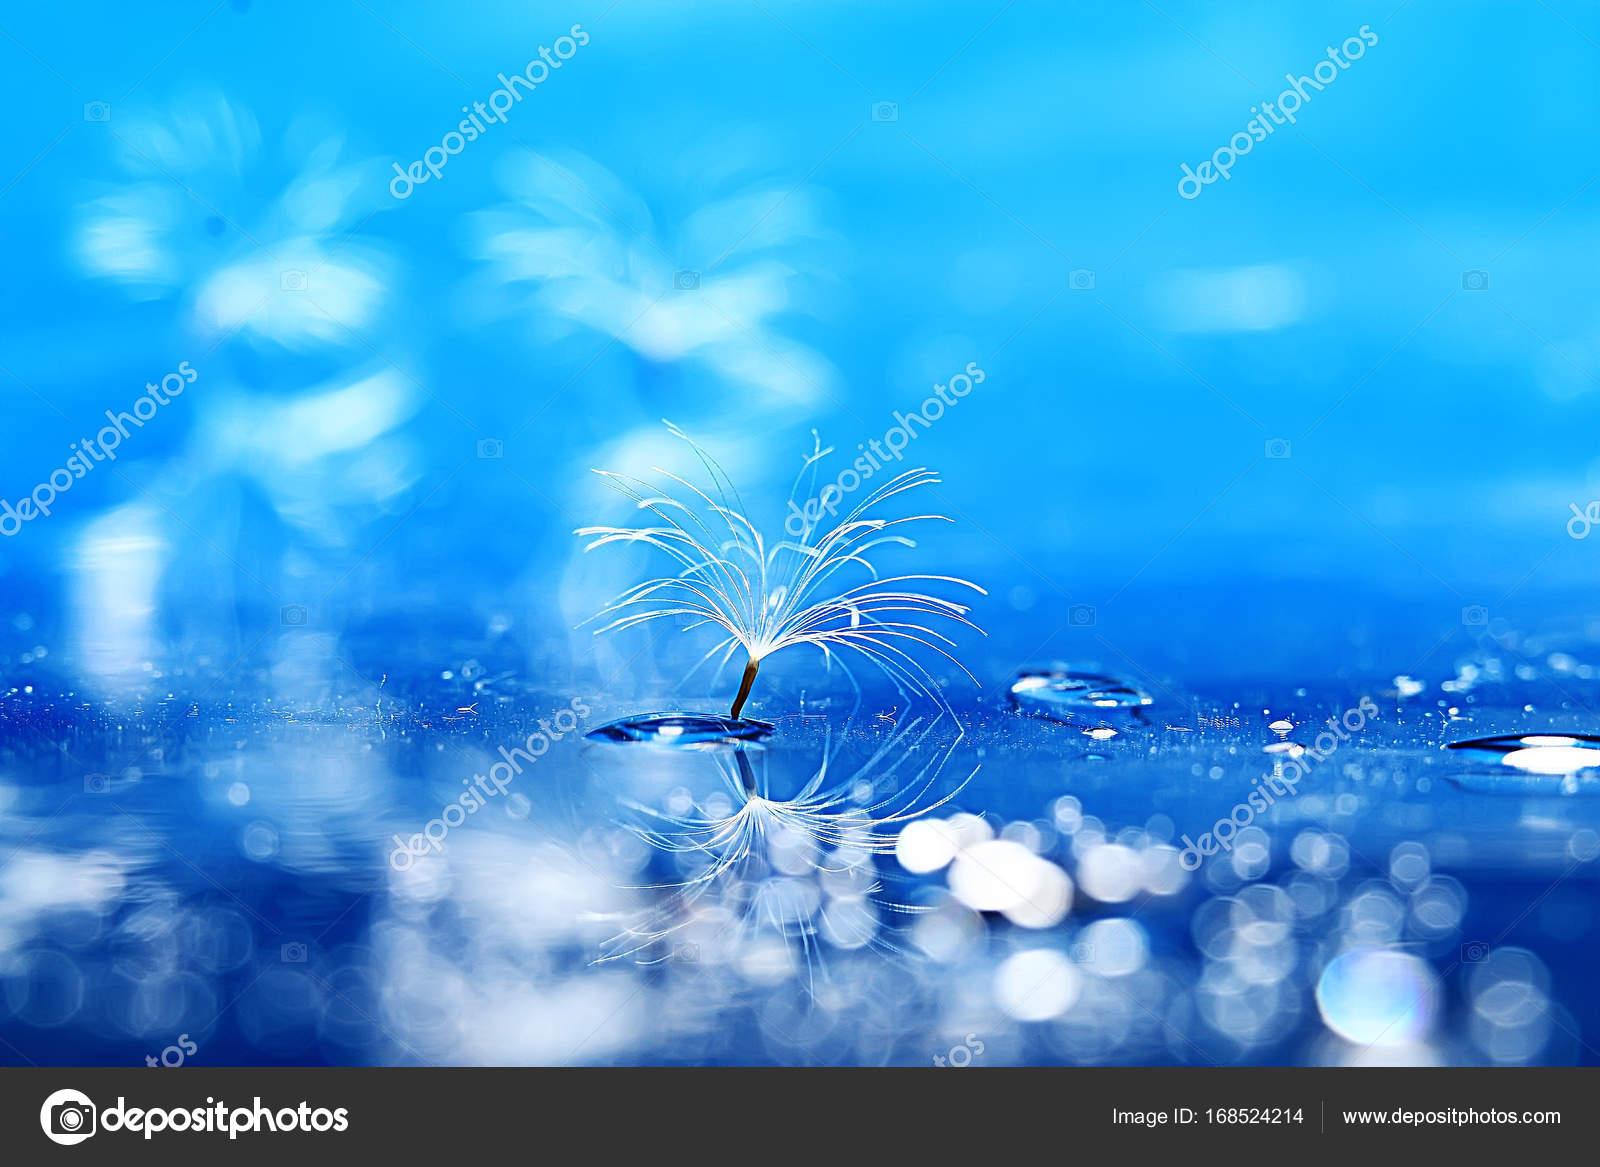 Dry Dandelion Parachute Seed Light Blue Background Summer Nature